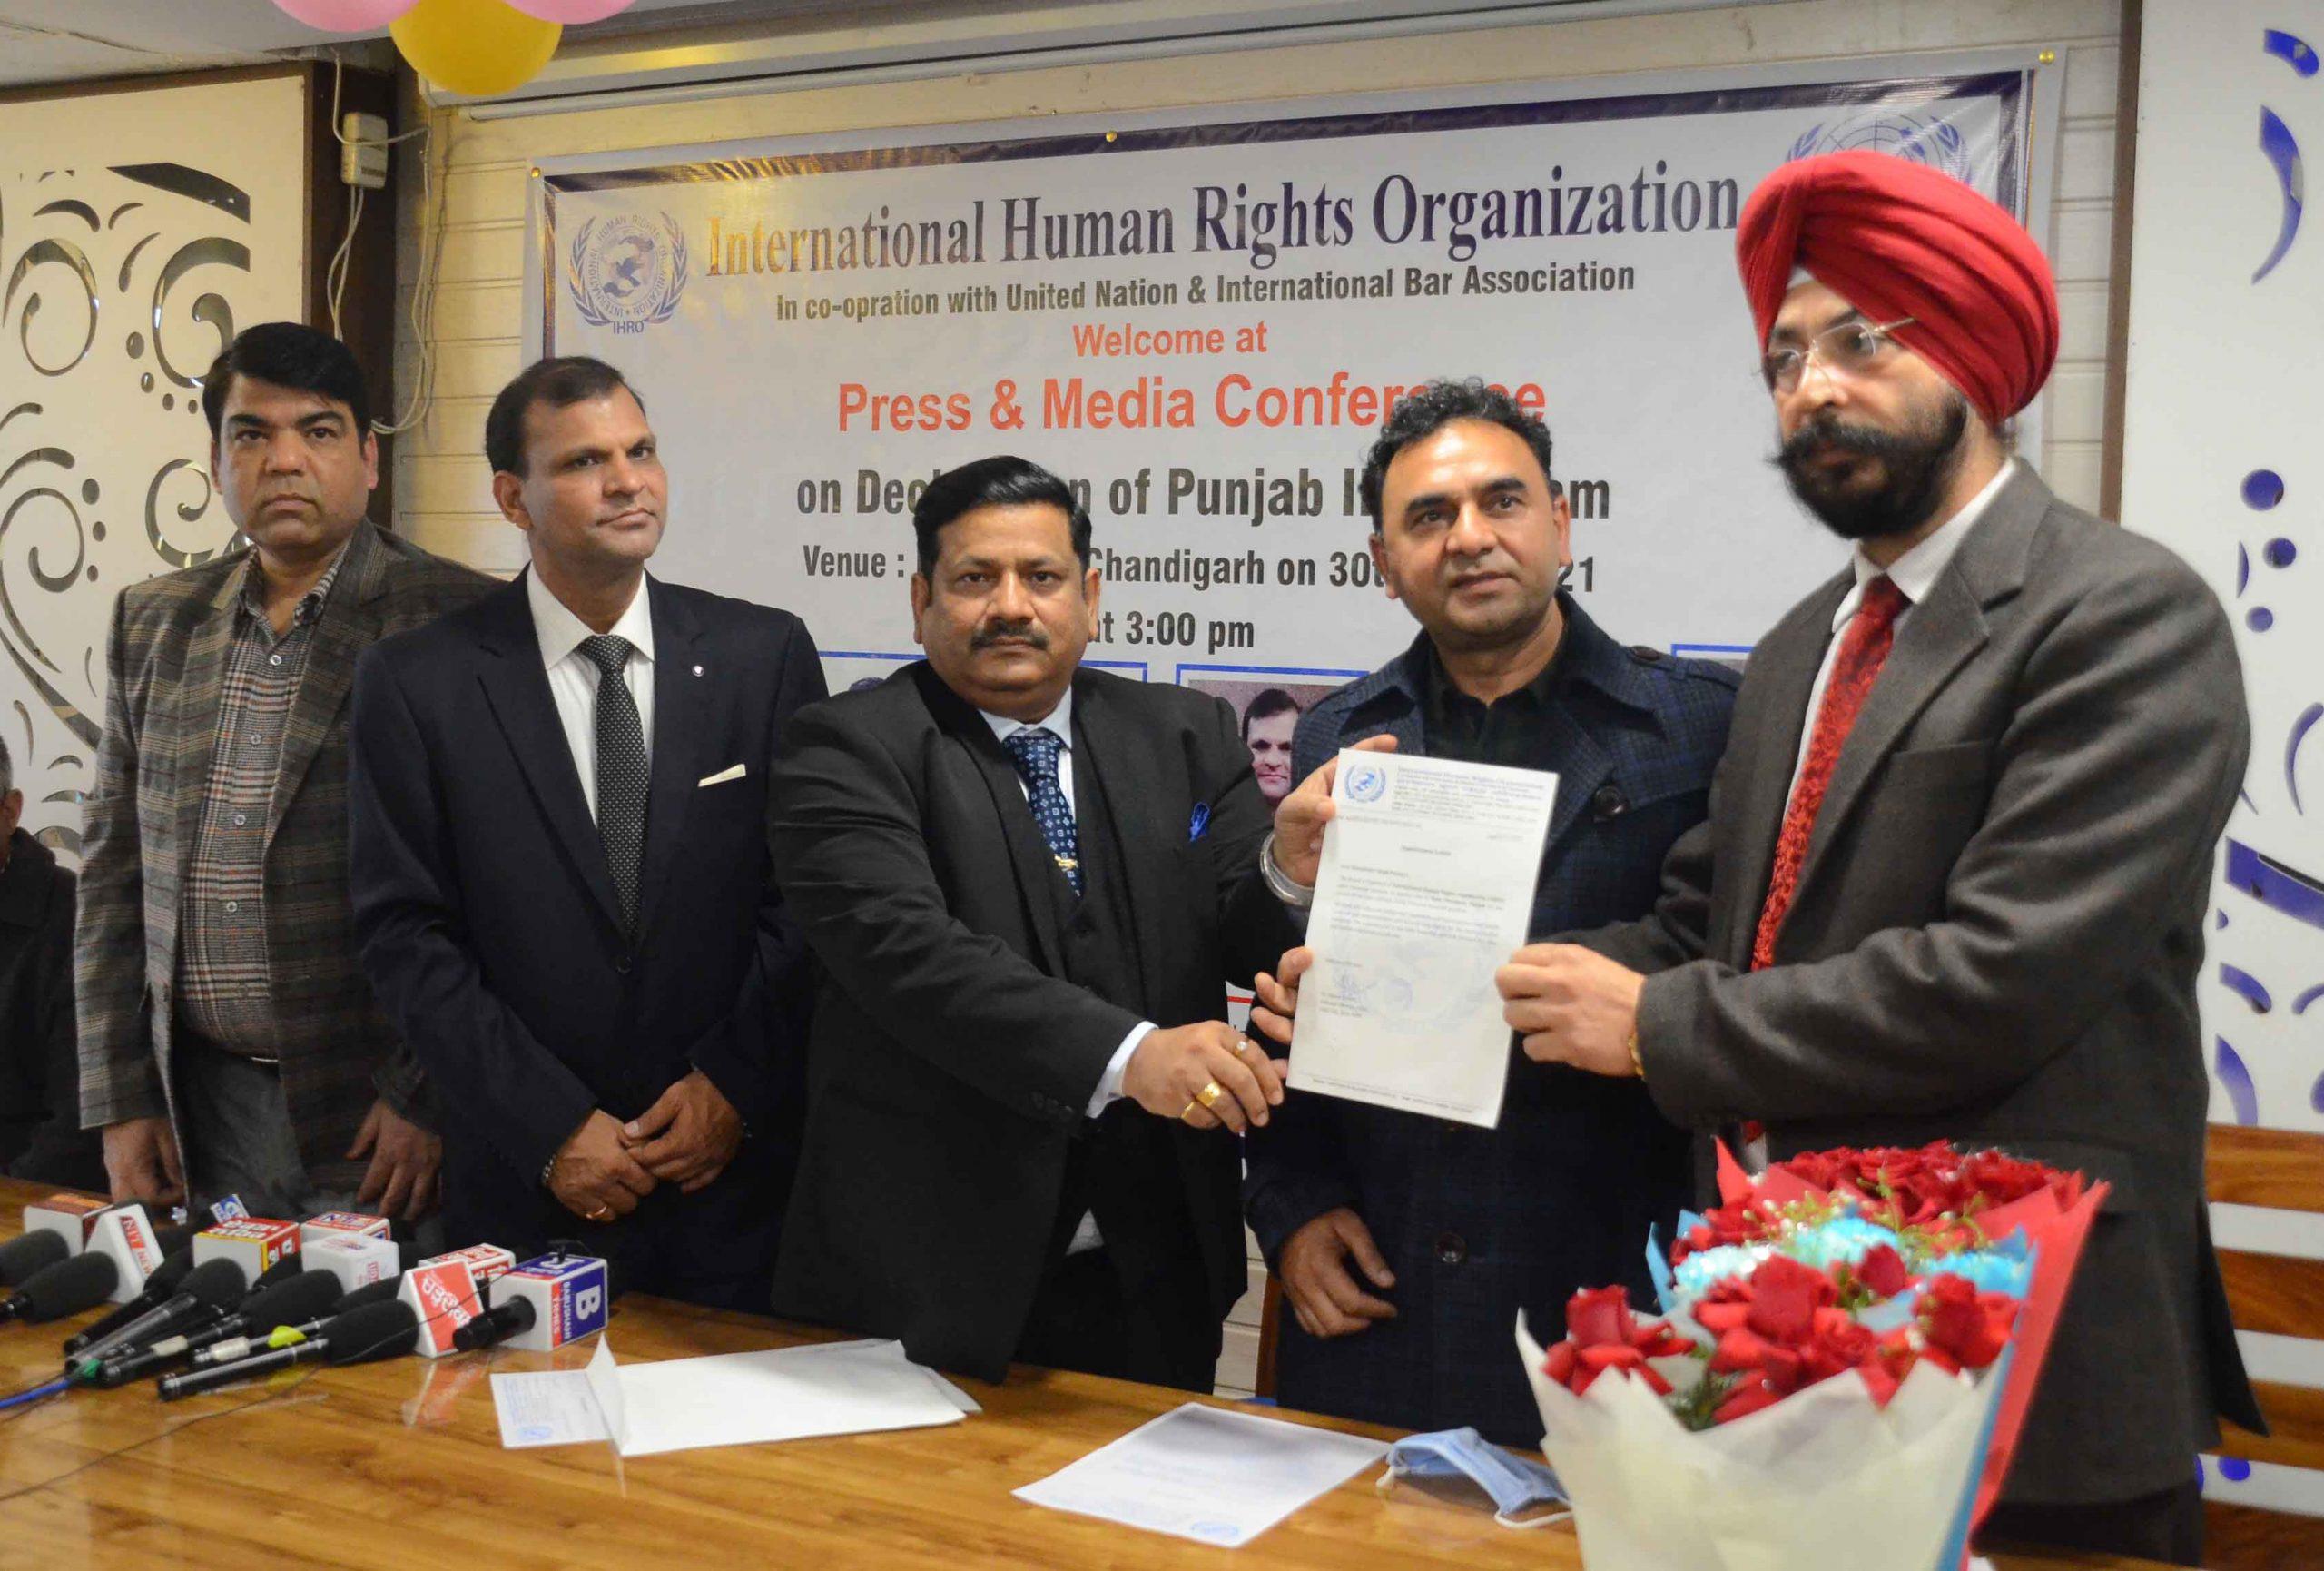 IHRO announced Punjab team